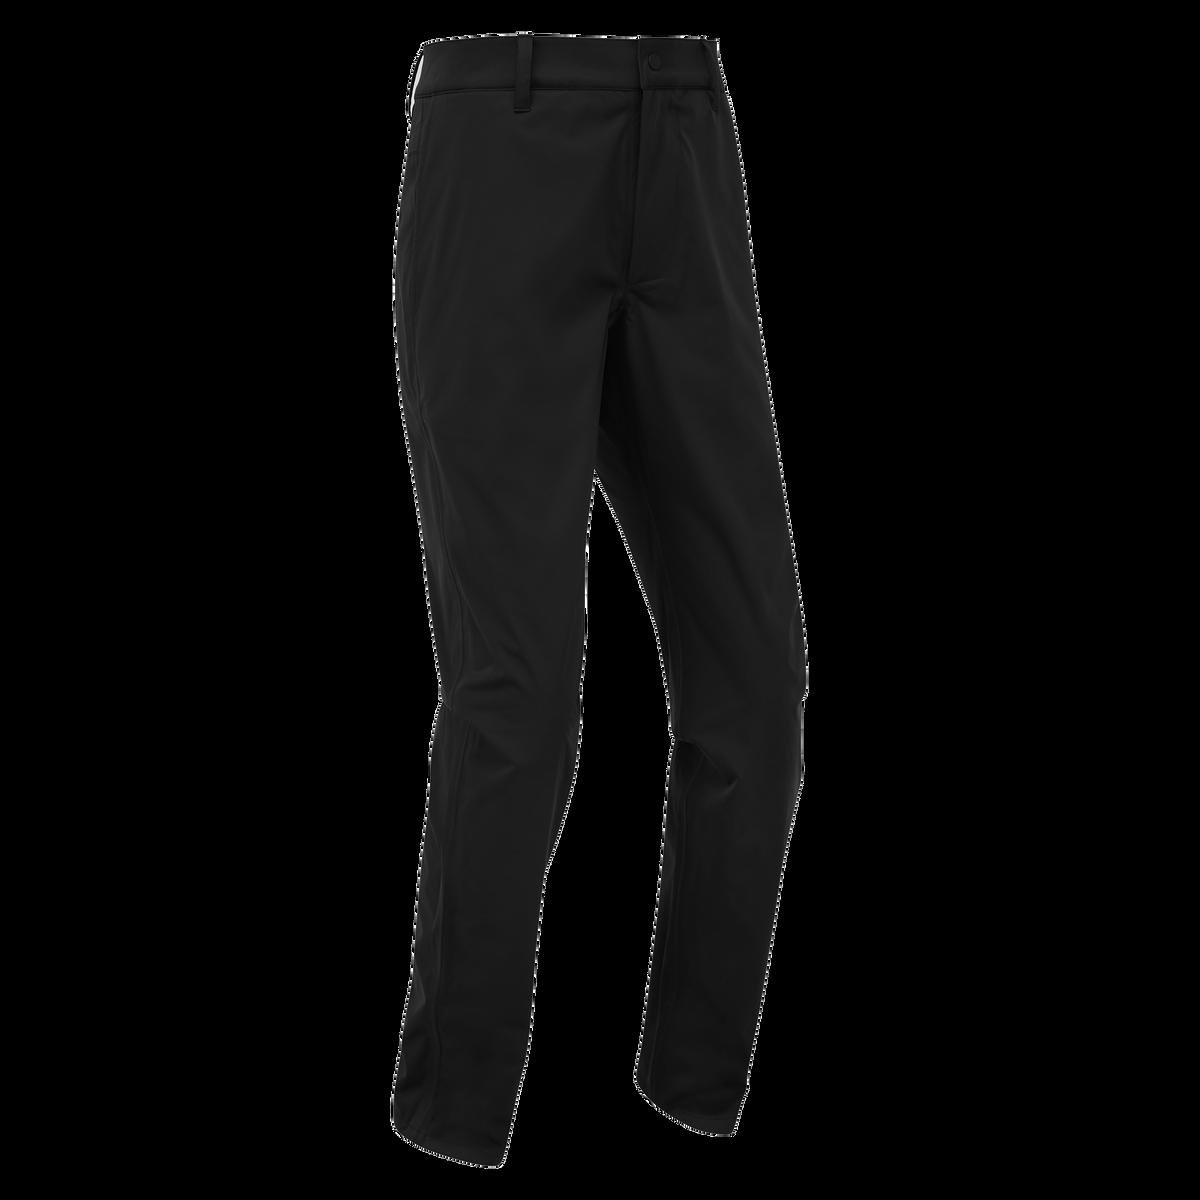 FJ HydroKnit trousers